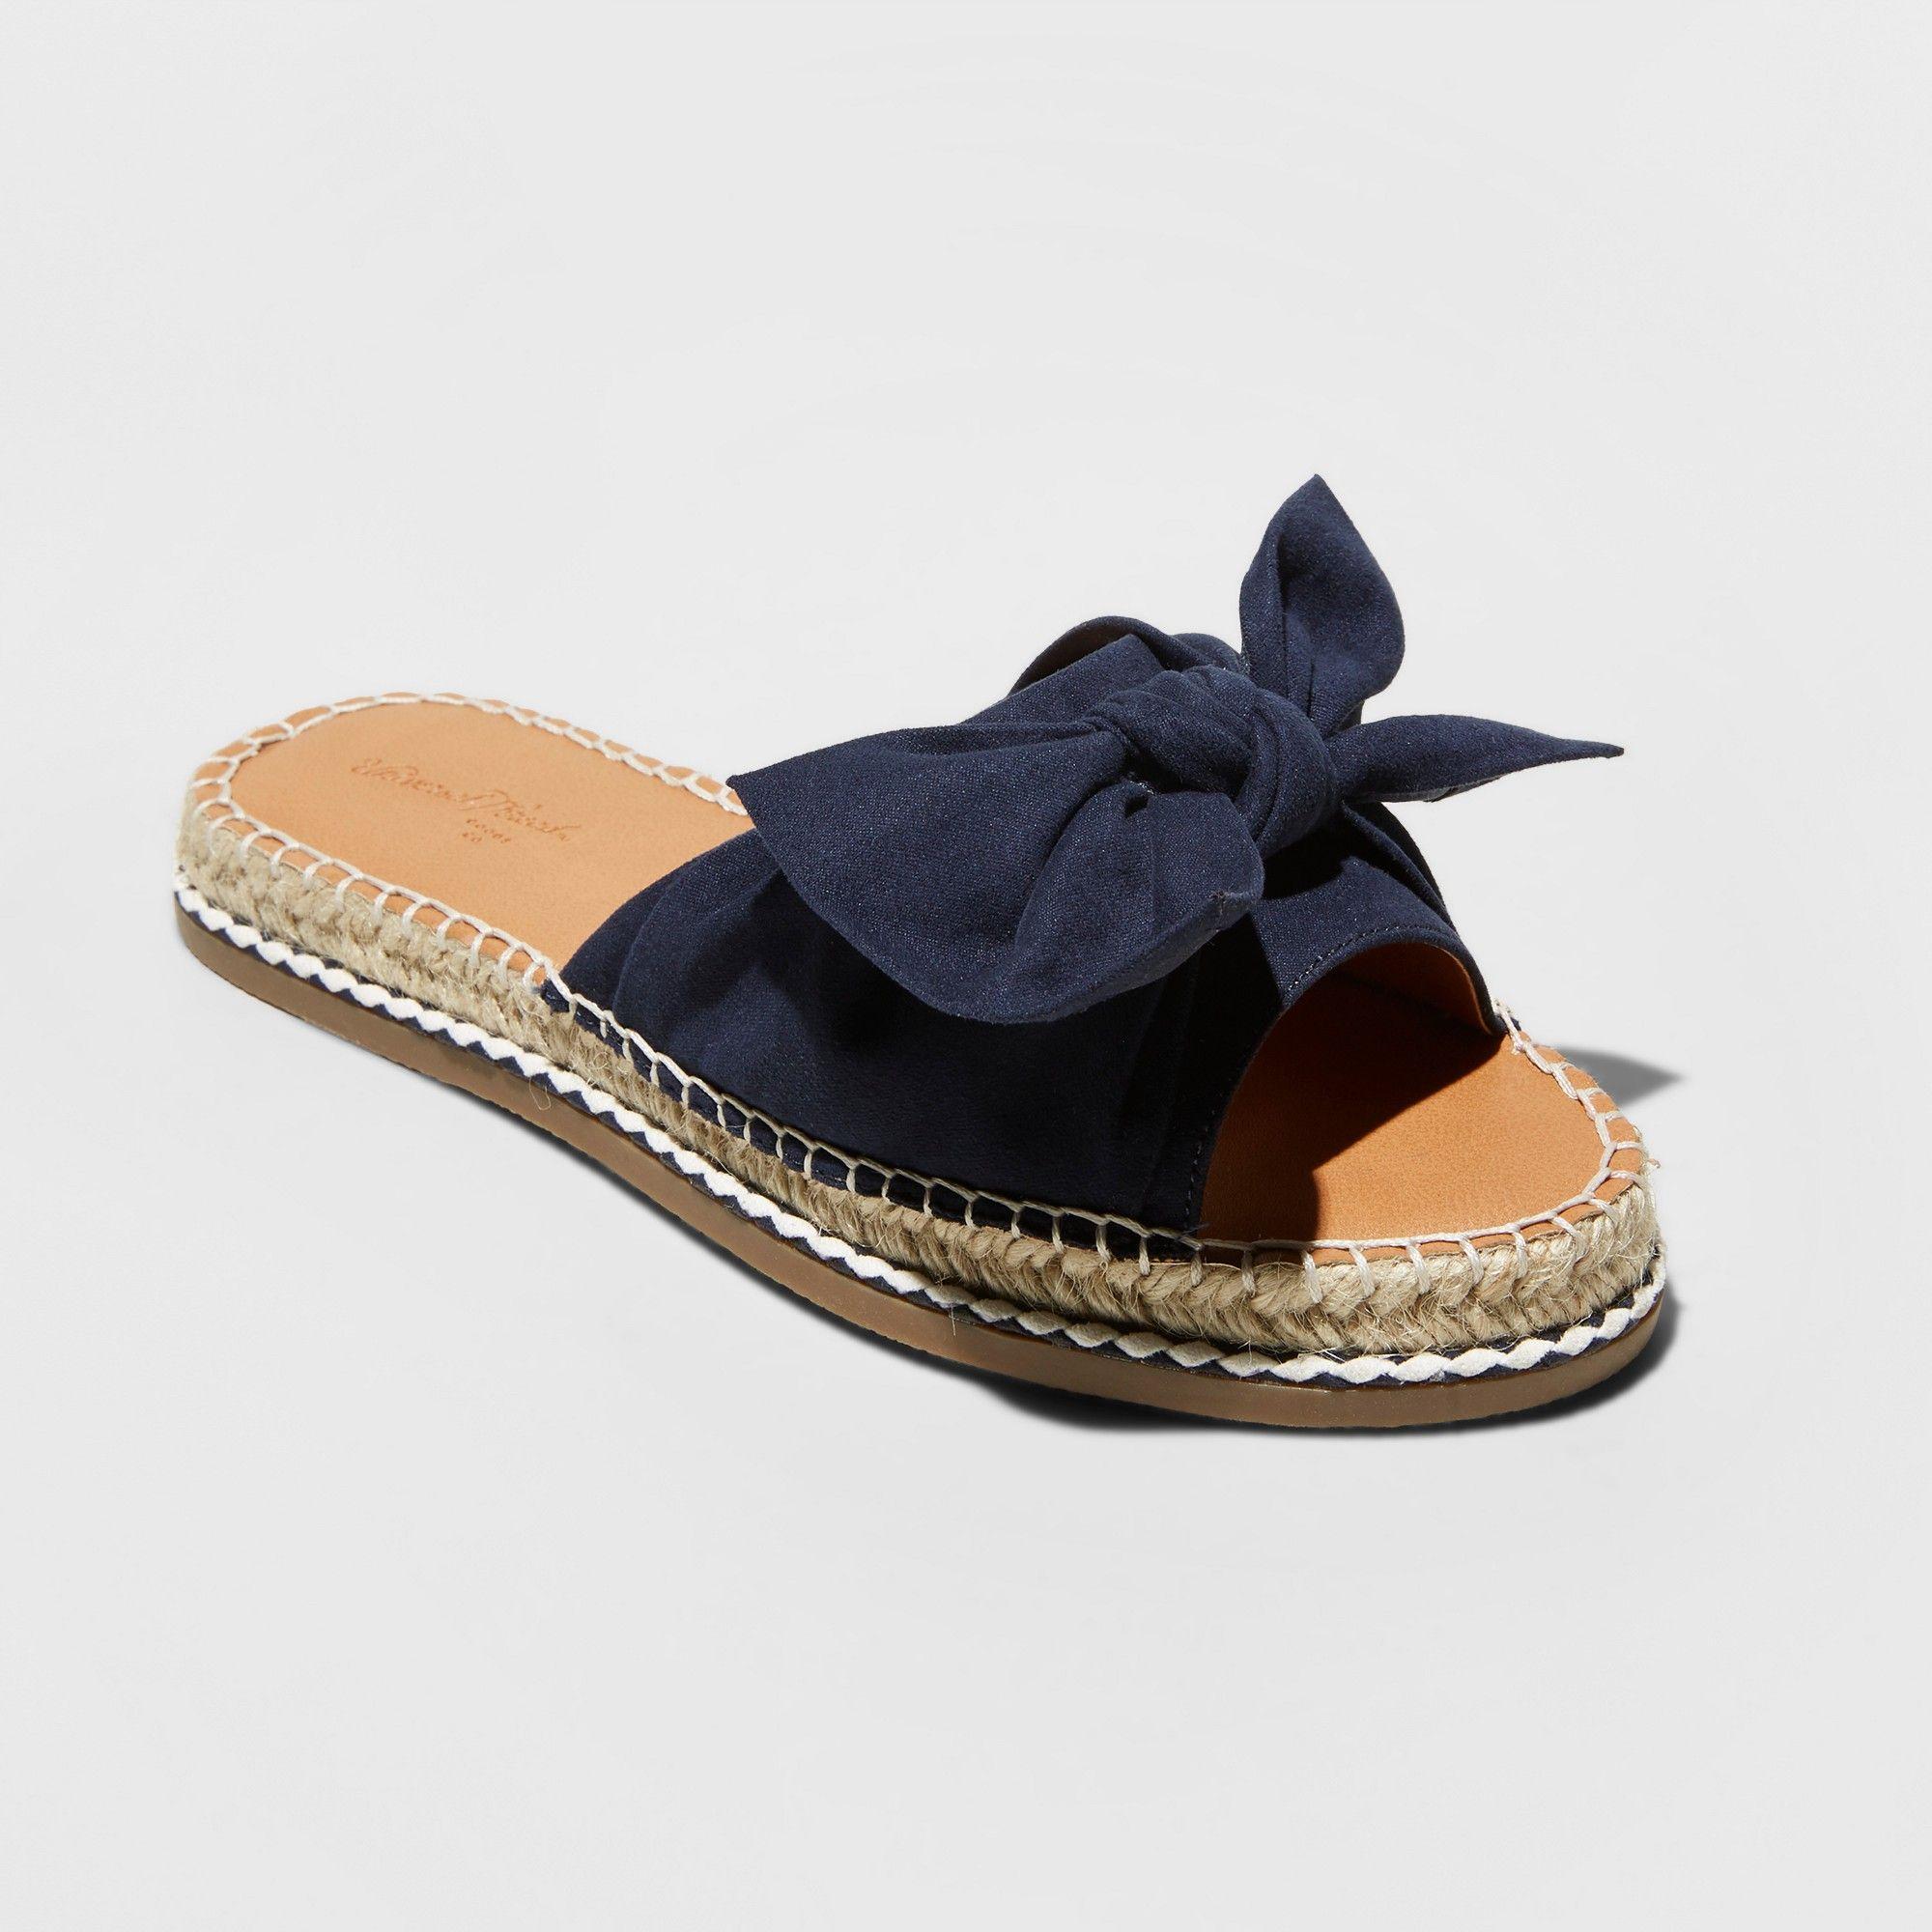 1524f92d1d8 Women's Sigma Wide Width Bow Espadrille Sandals - Universal Thread ...